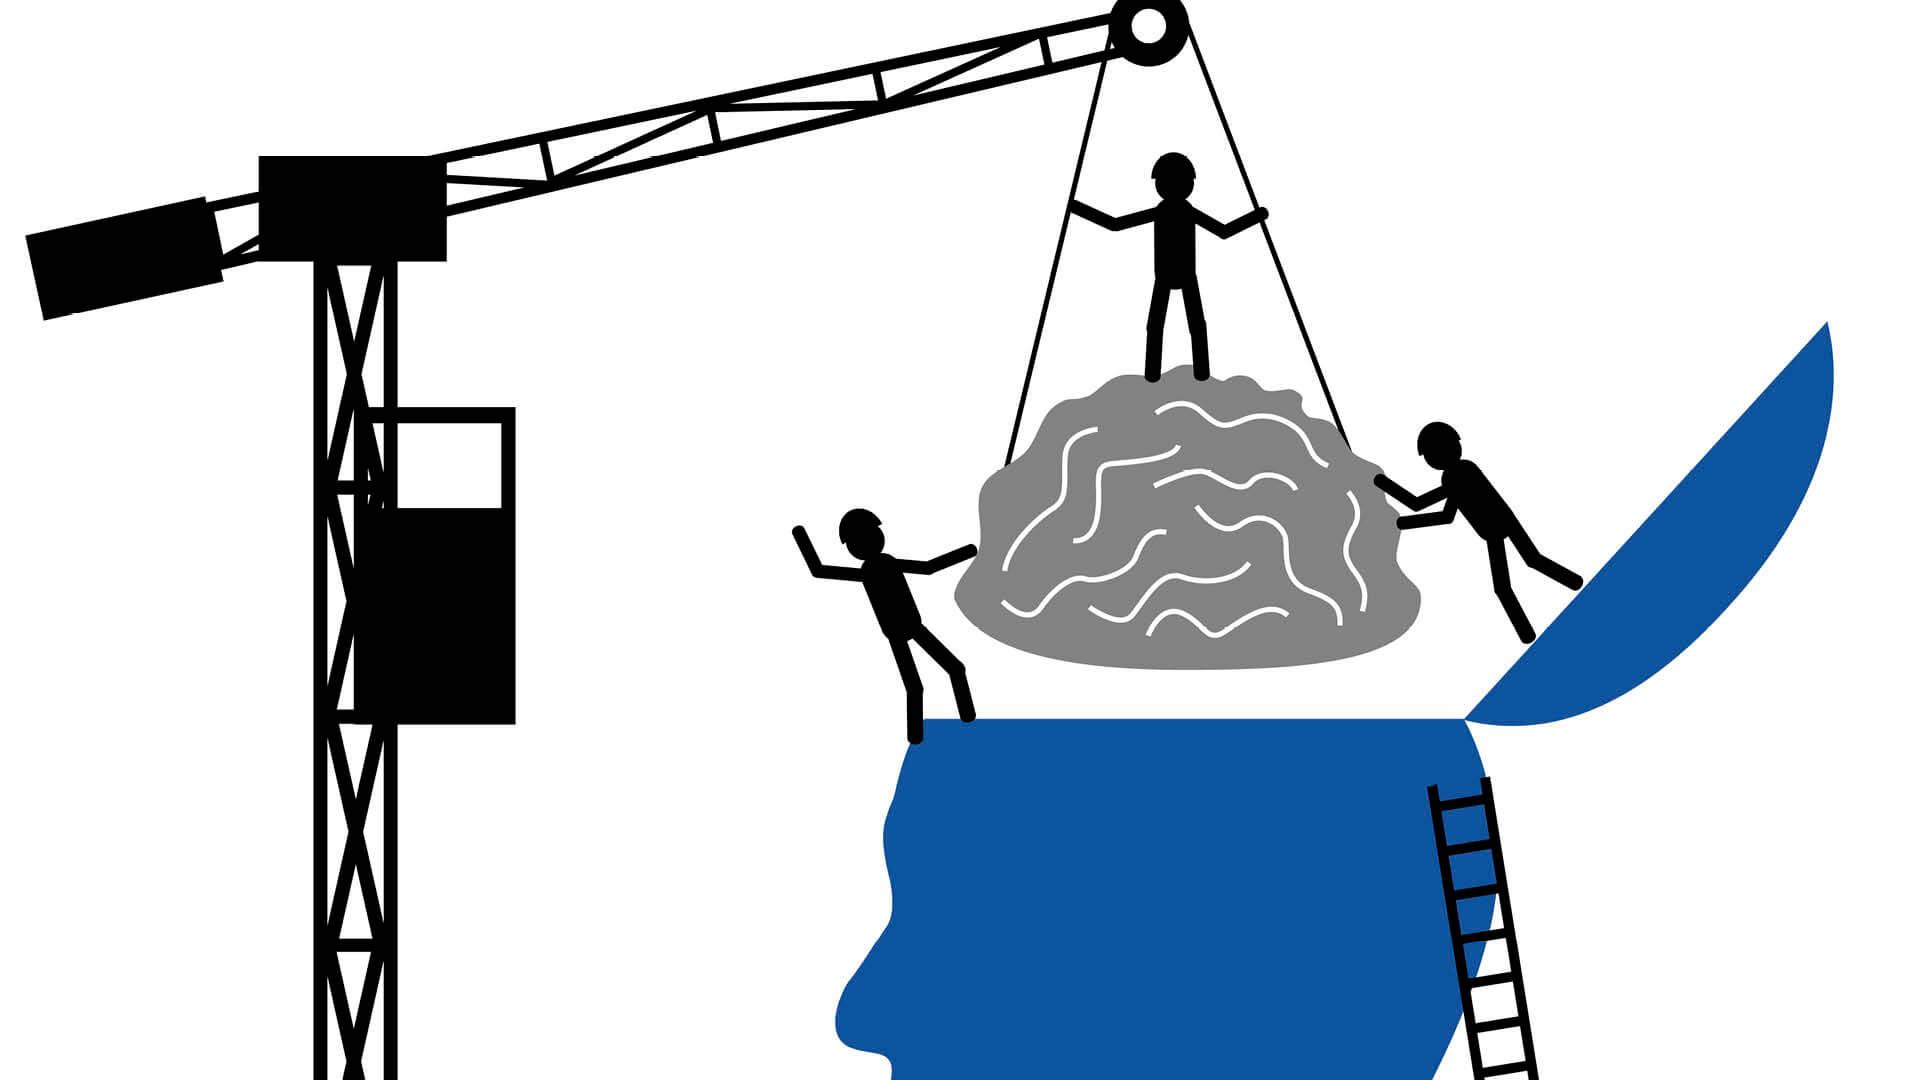 034 – Can You Repair a Leaky Brain